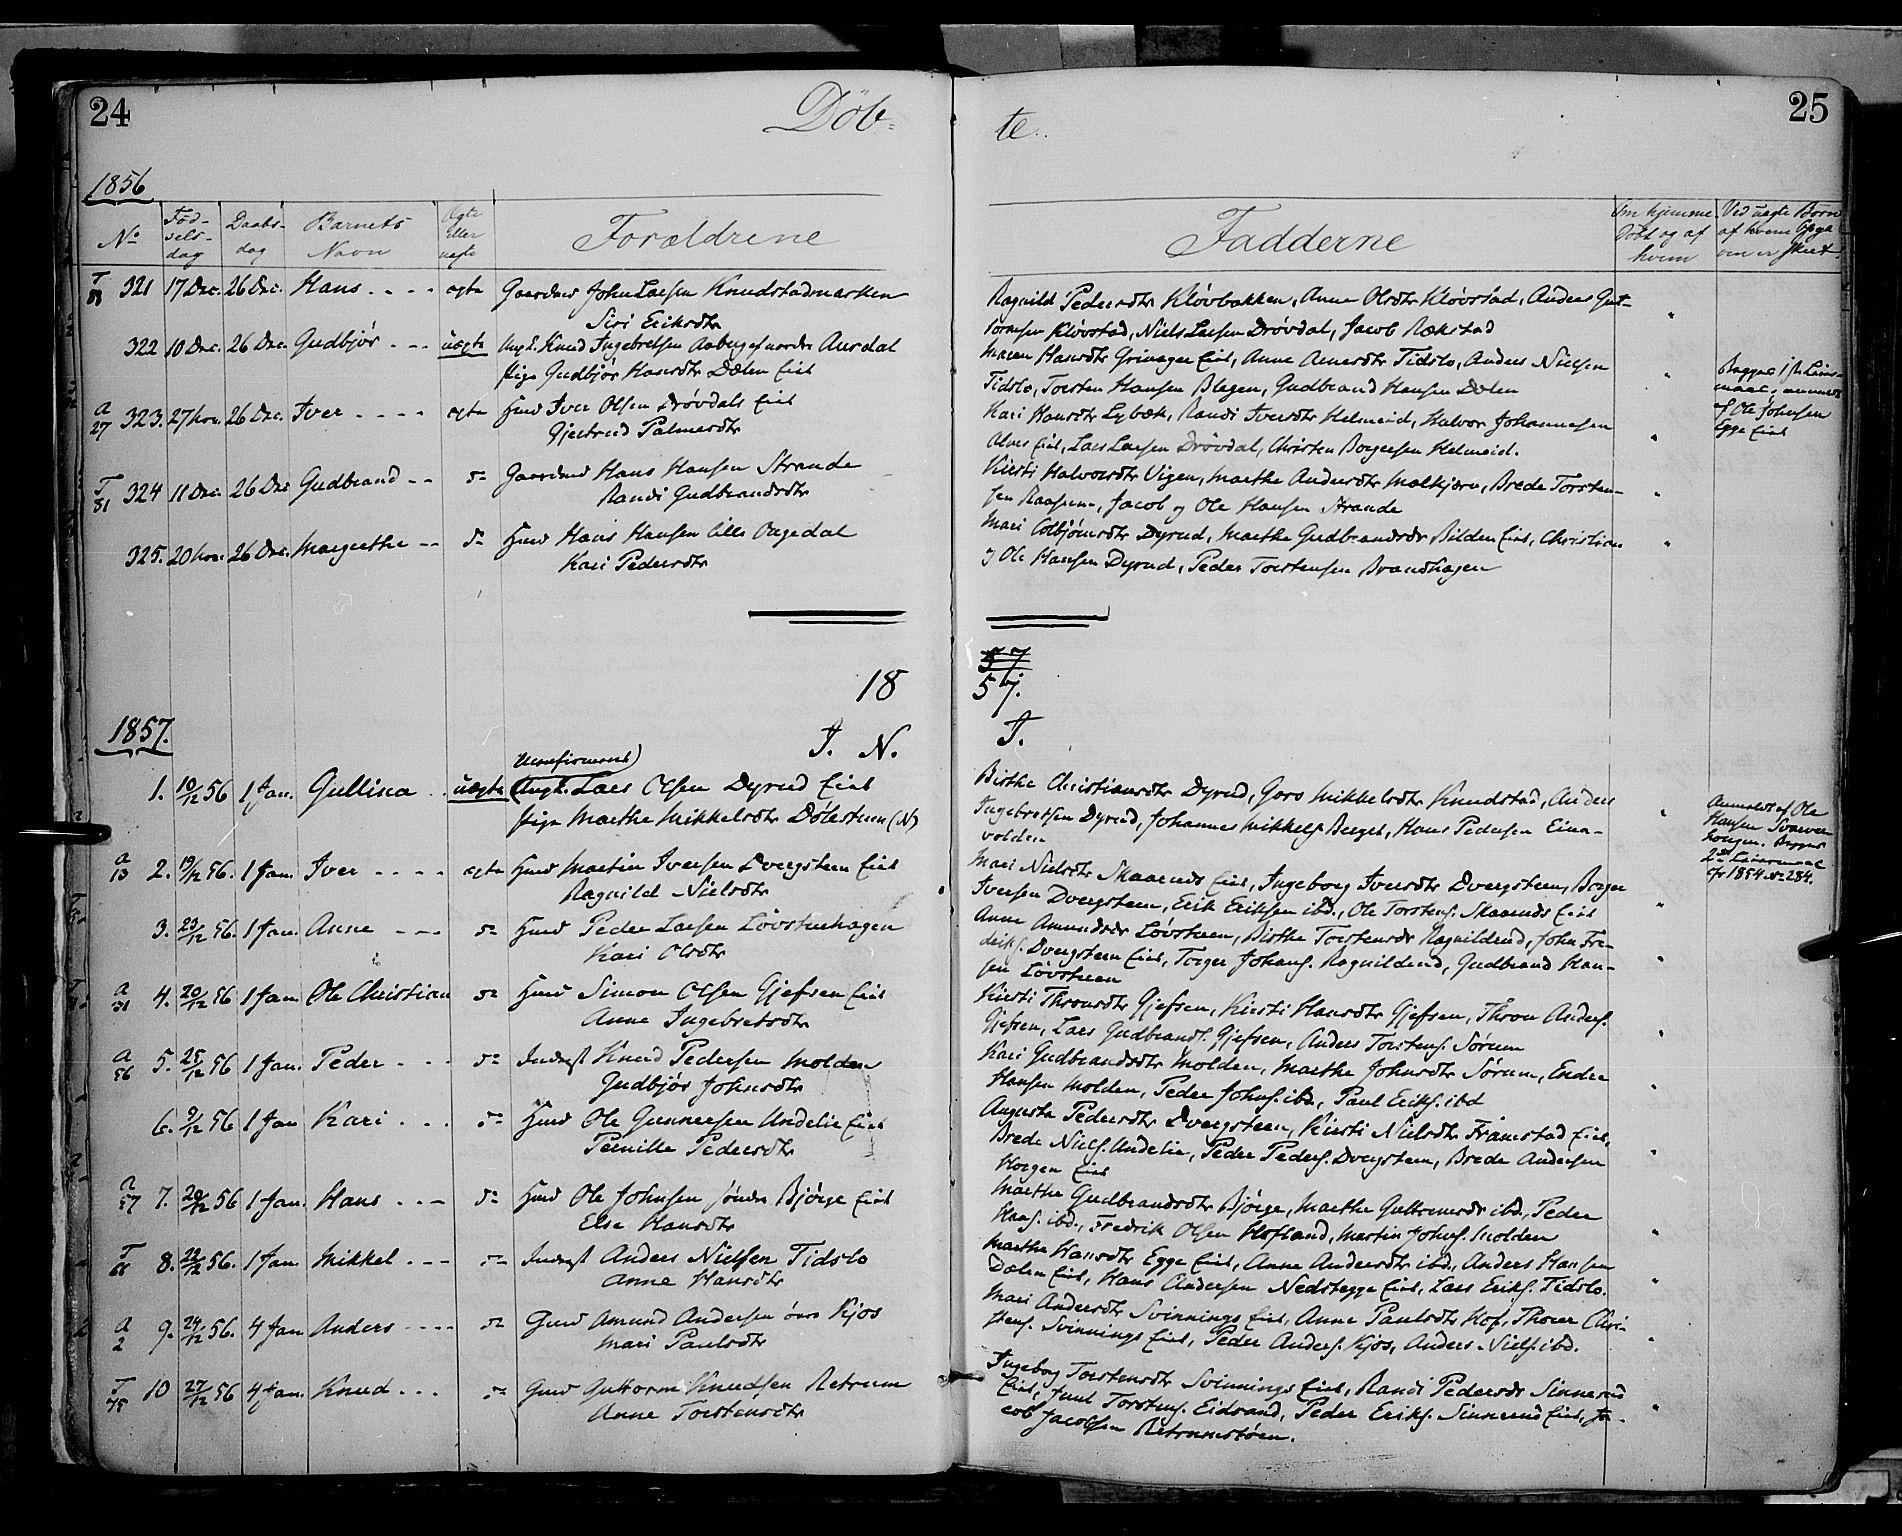 SAH, Gran prestekontor, Ministerialbok nr. 12, 1856-1874, s. 24-25